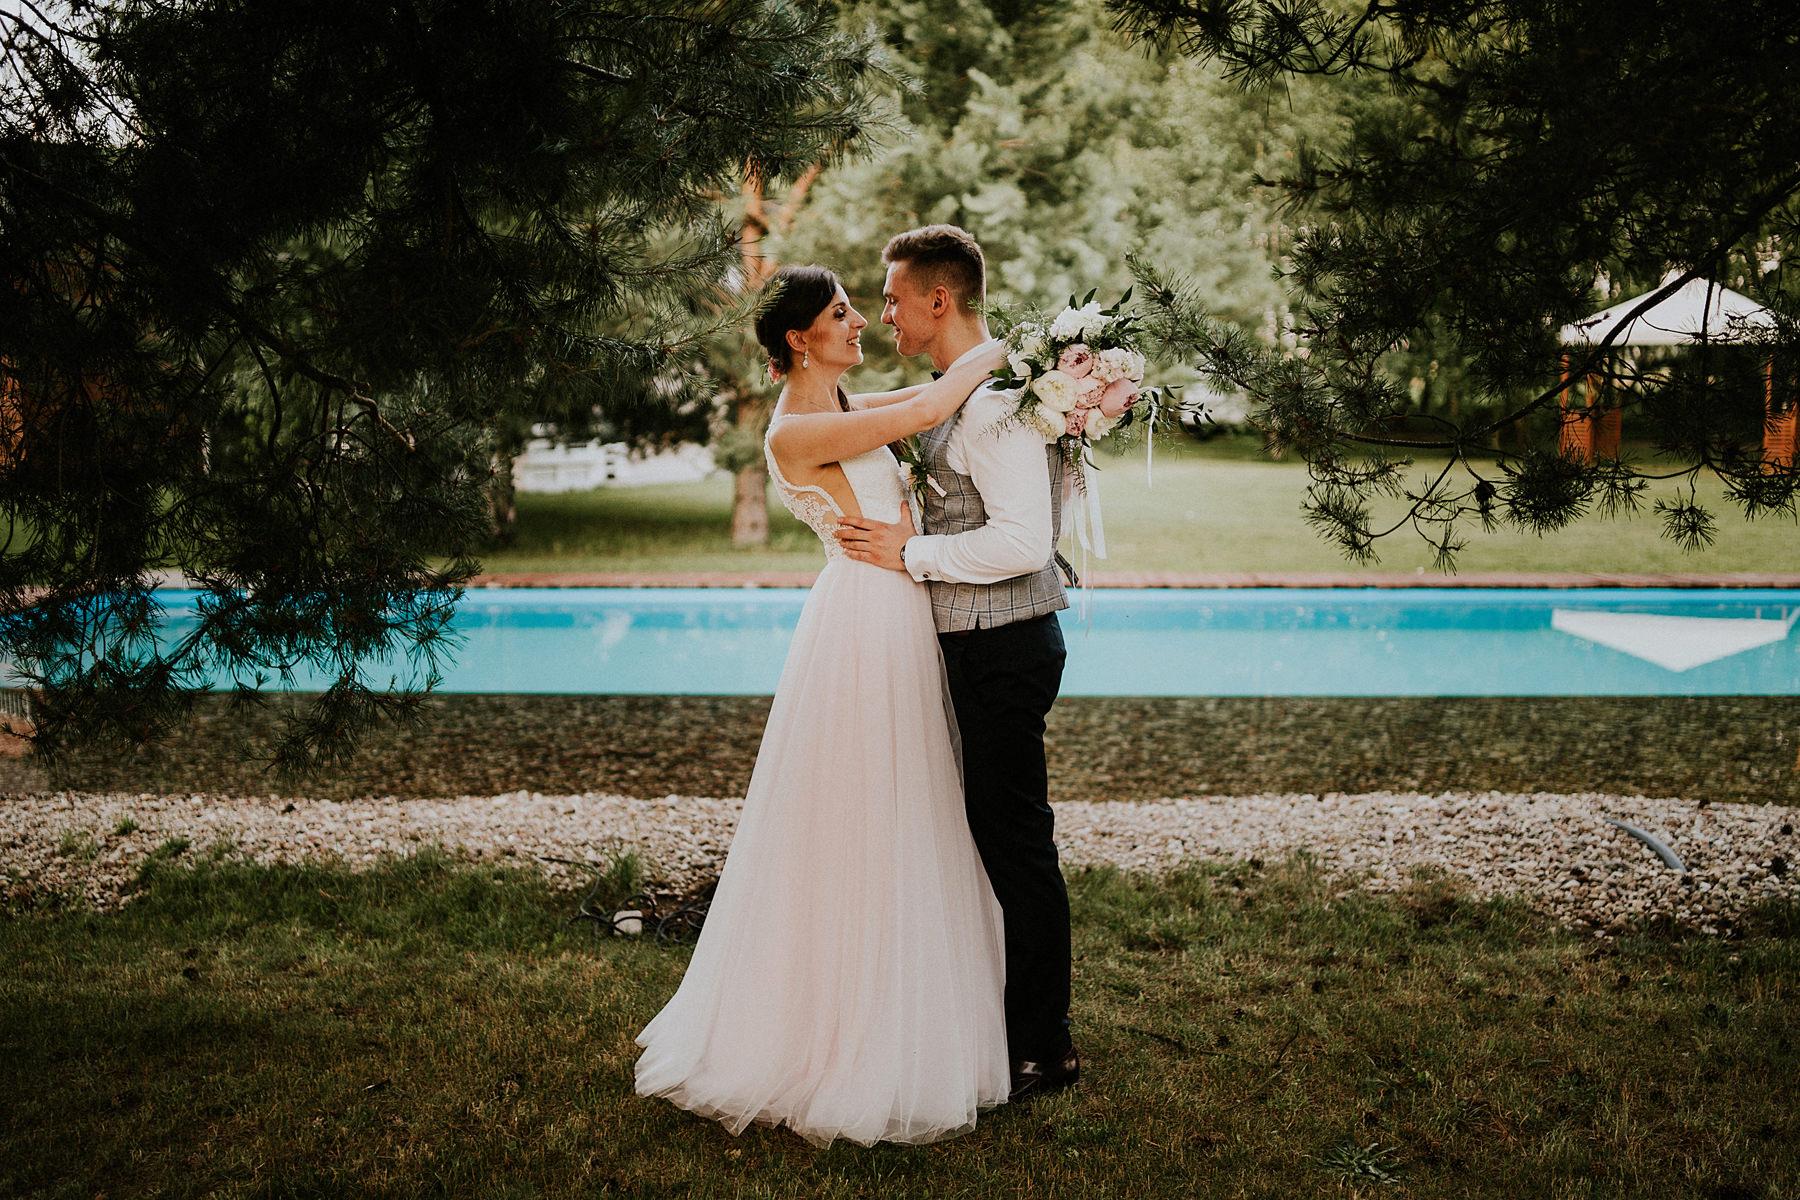 villa omnia ślub plenerowy wesele